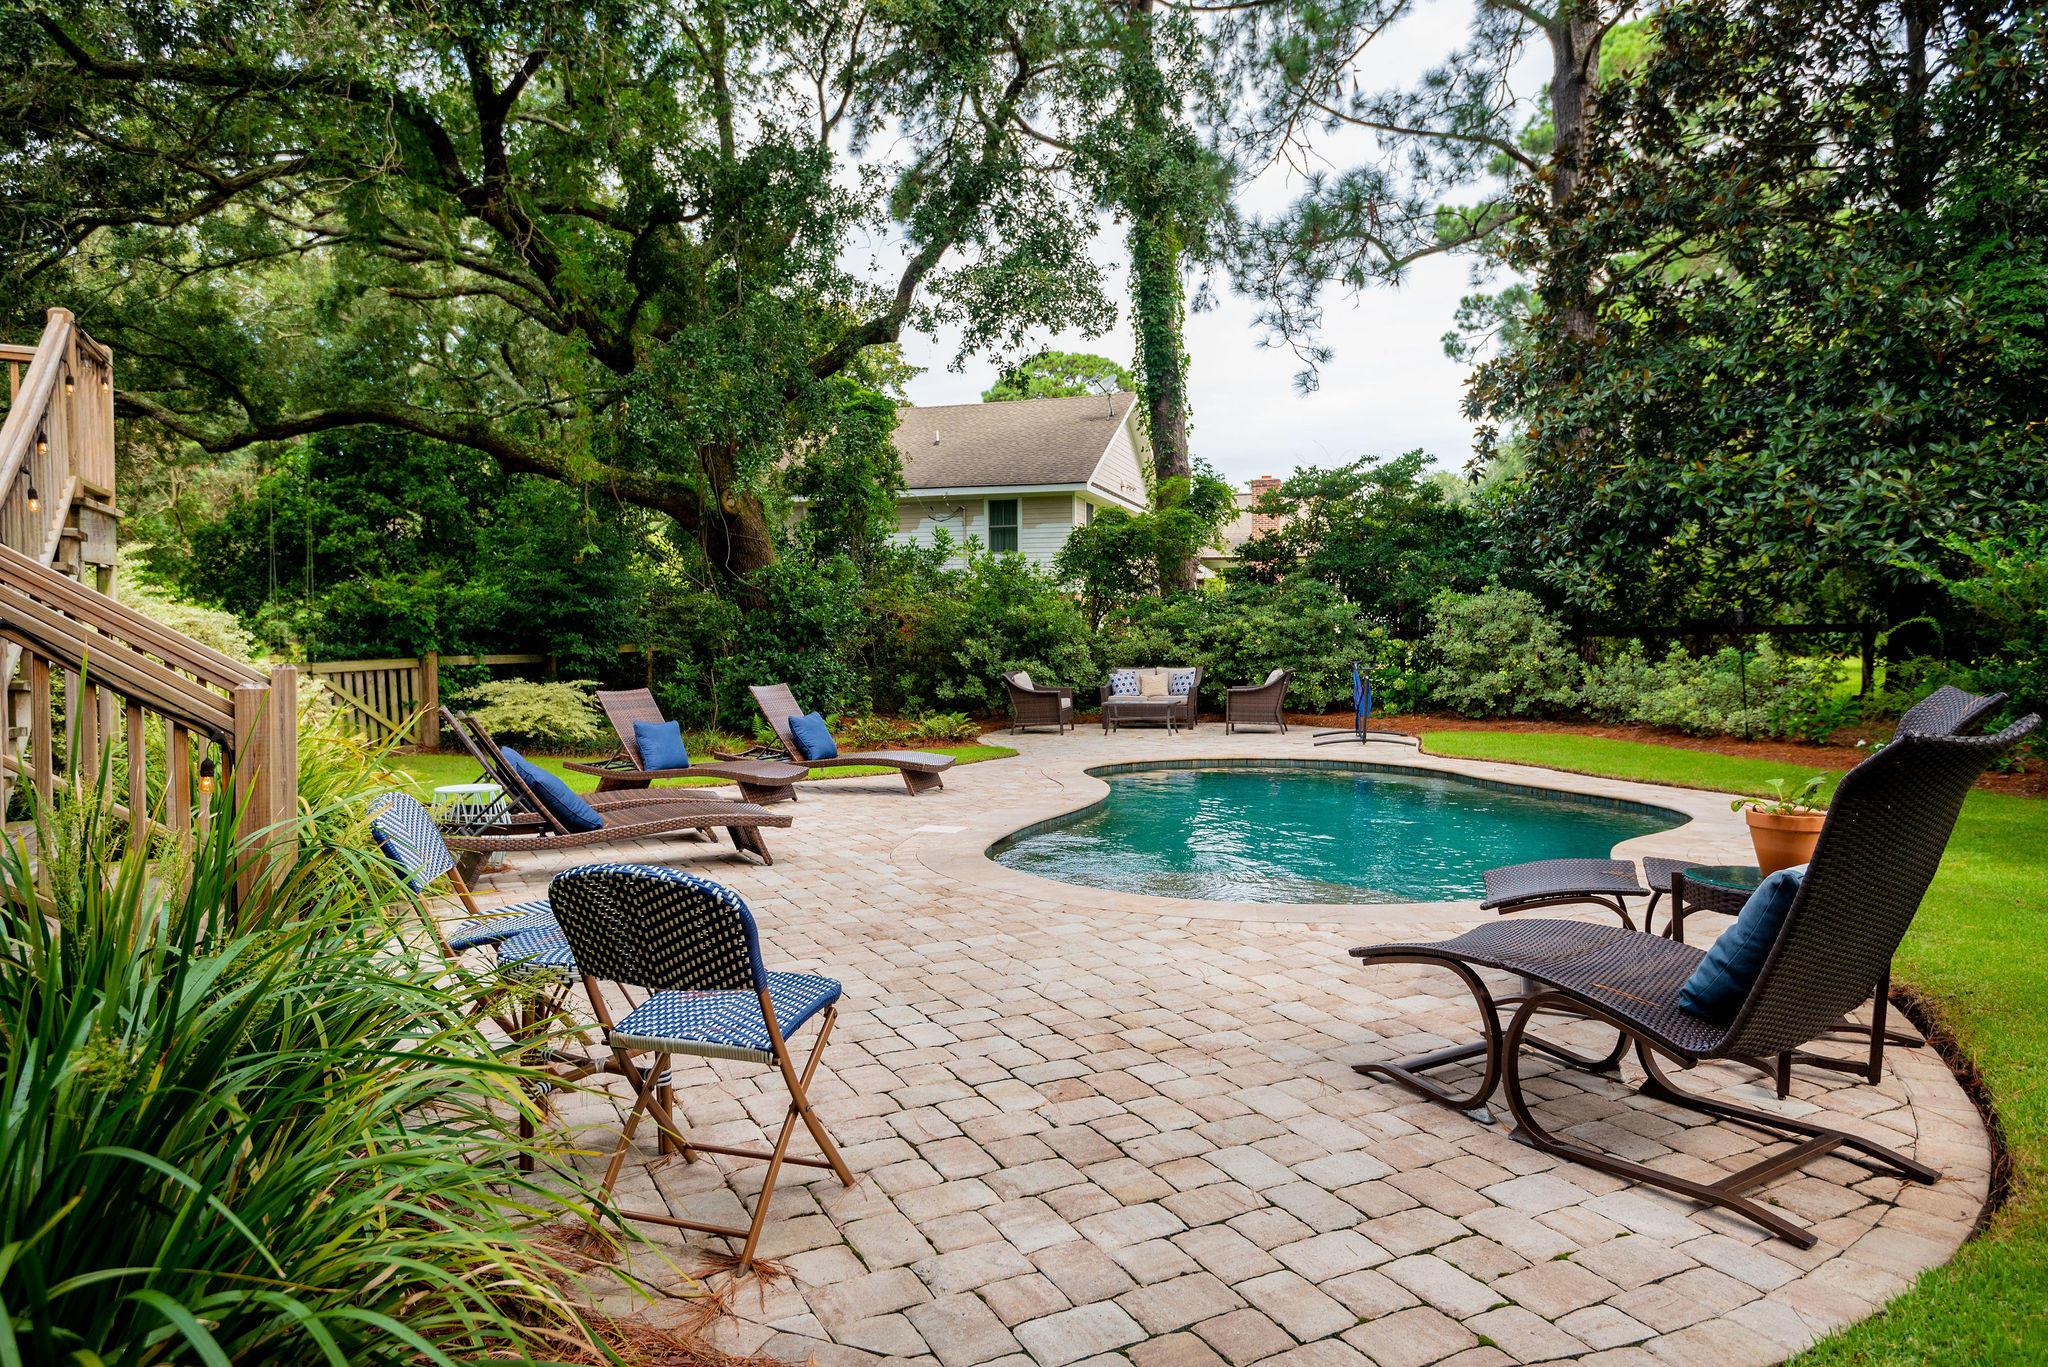 Country Club II Homes For Sale - 1482 Burningtree, Charleston, SC - 12